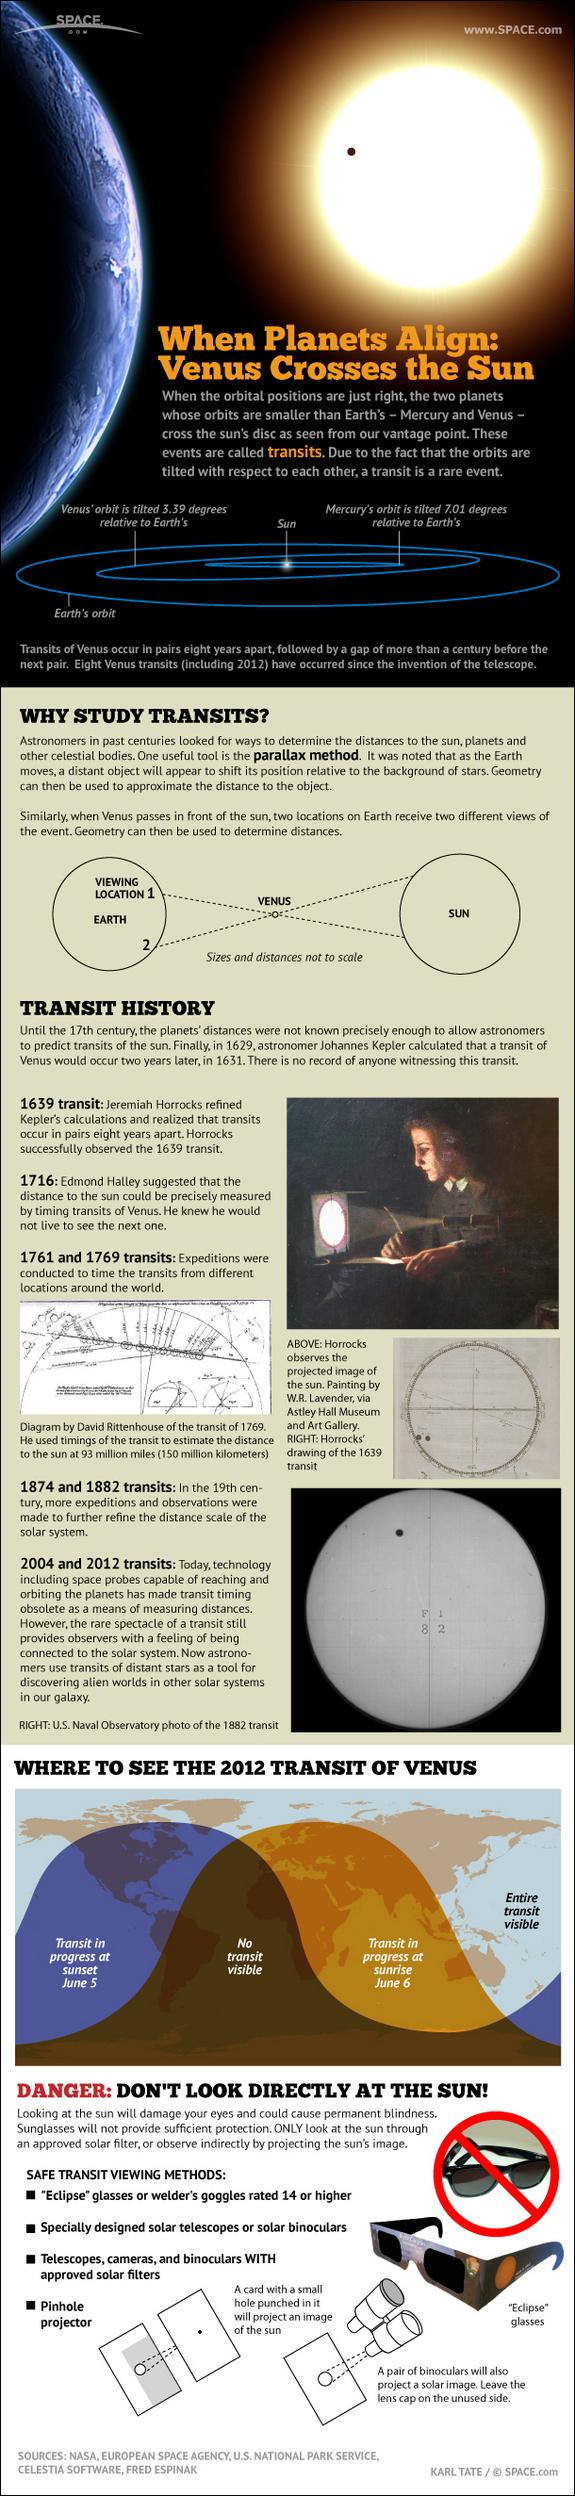 Transit- A rare event